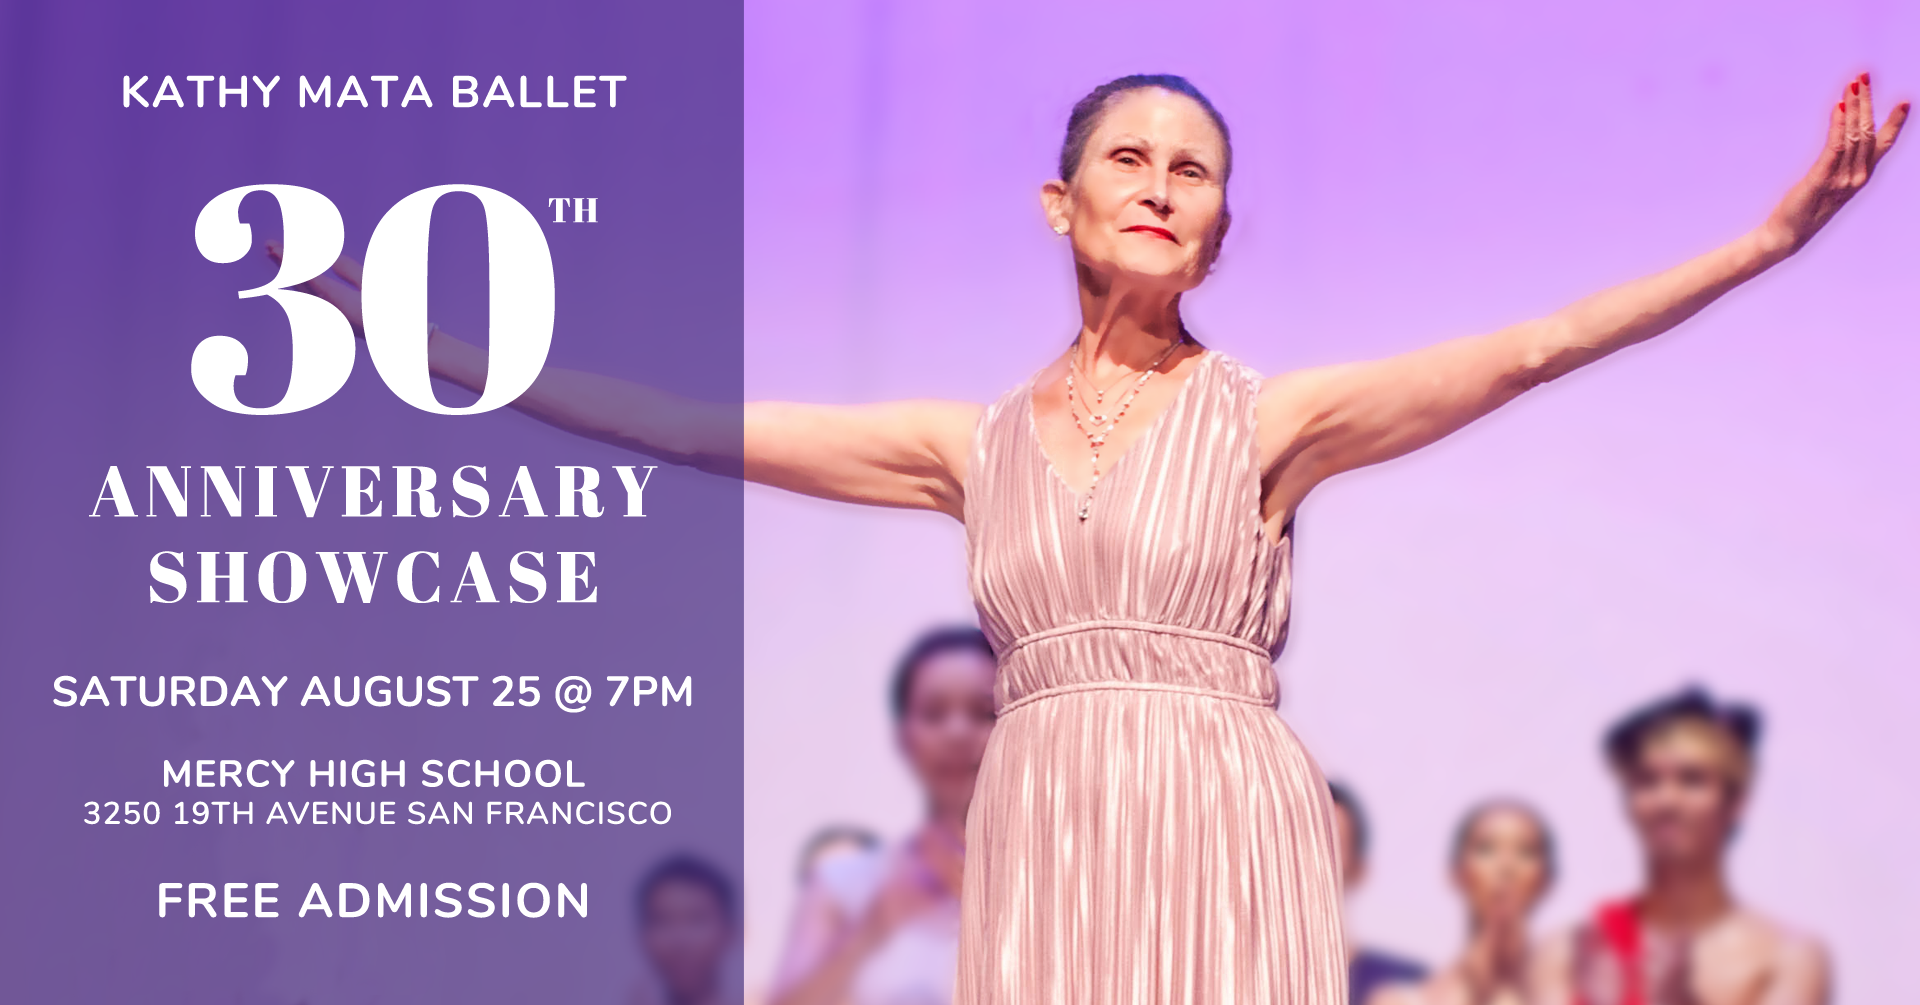 Kathy Mata Ballet 30th Anniversary Showcase